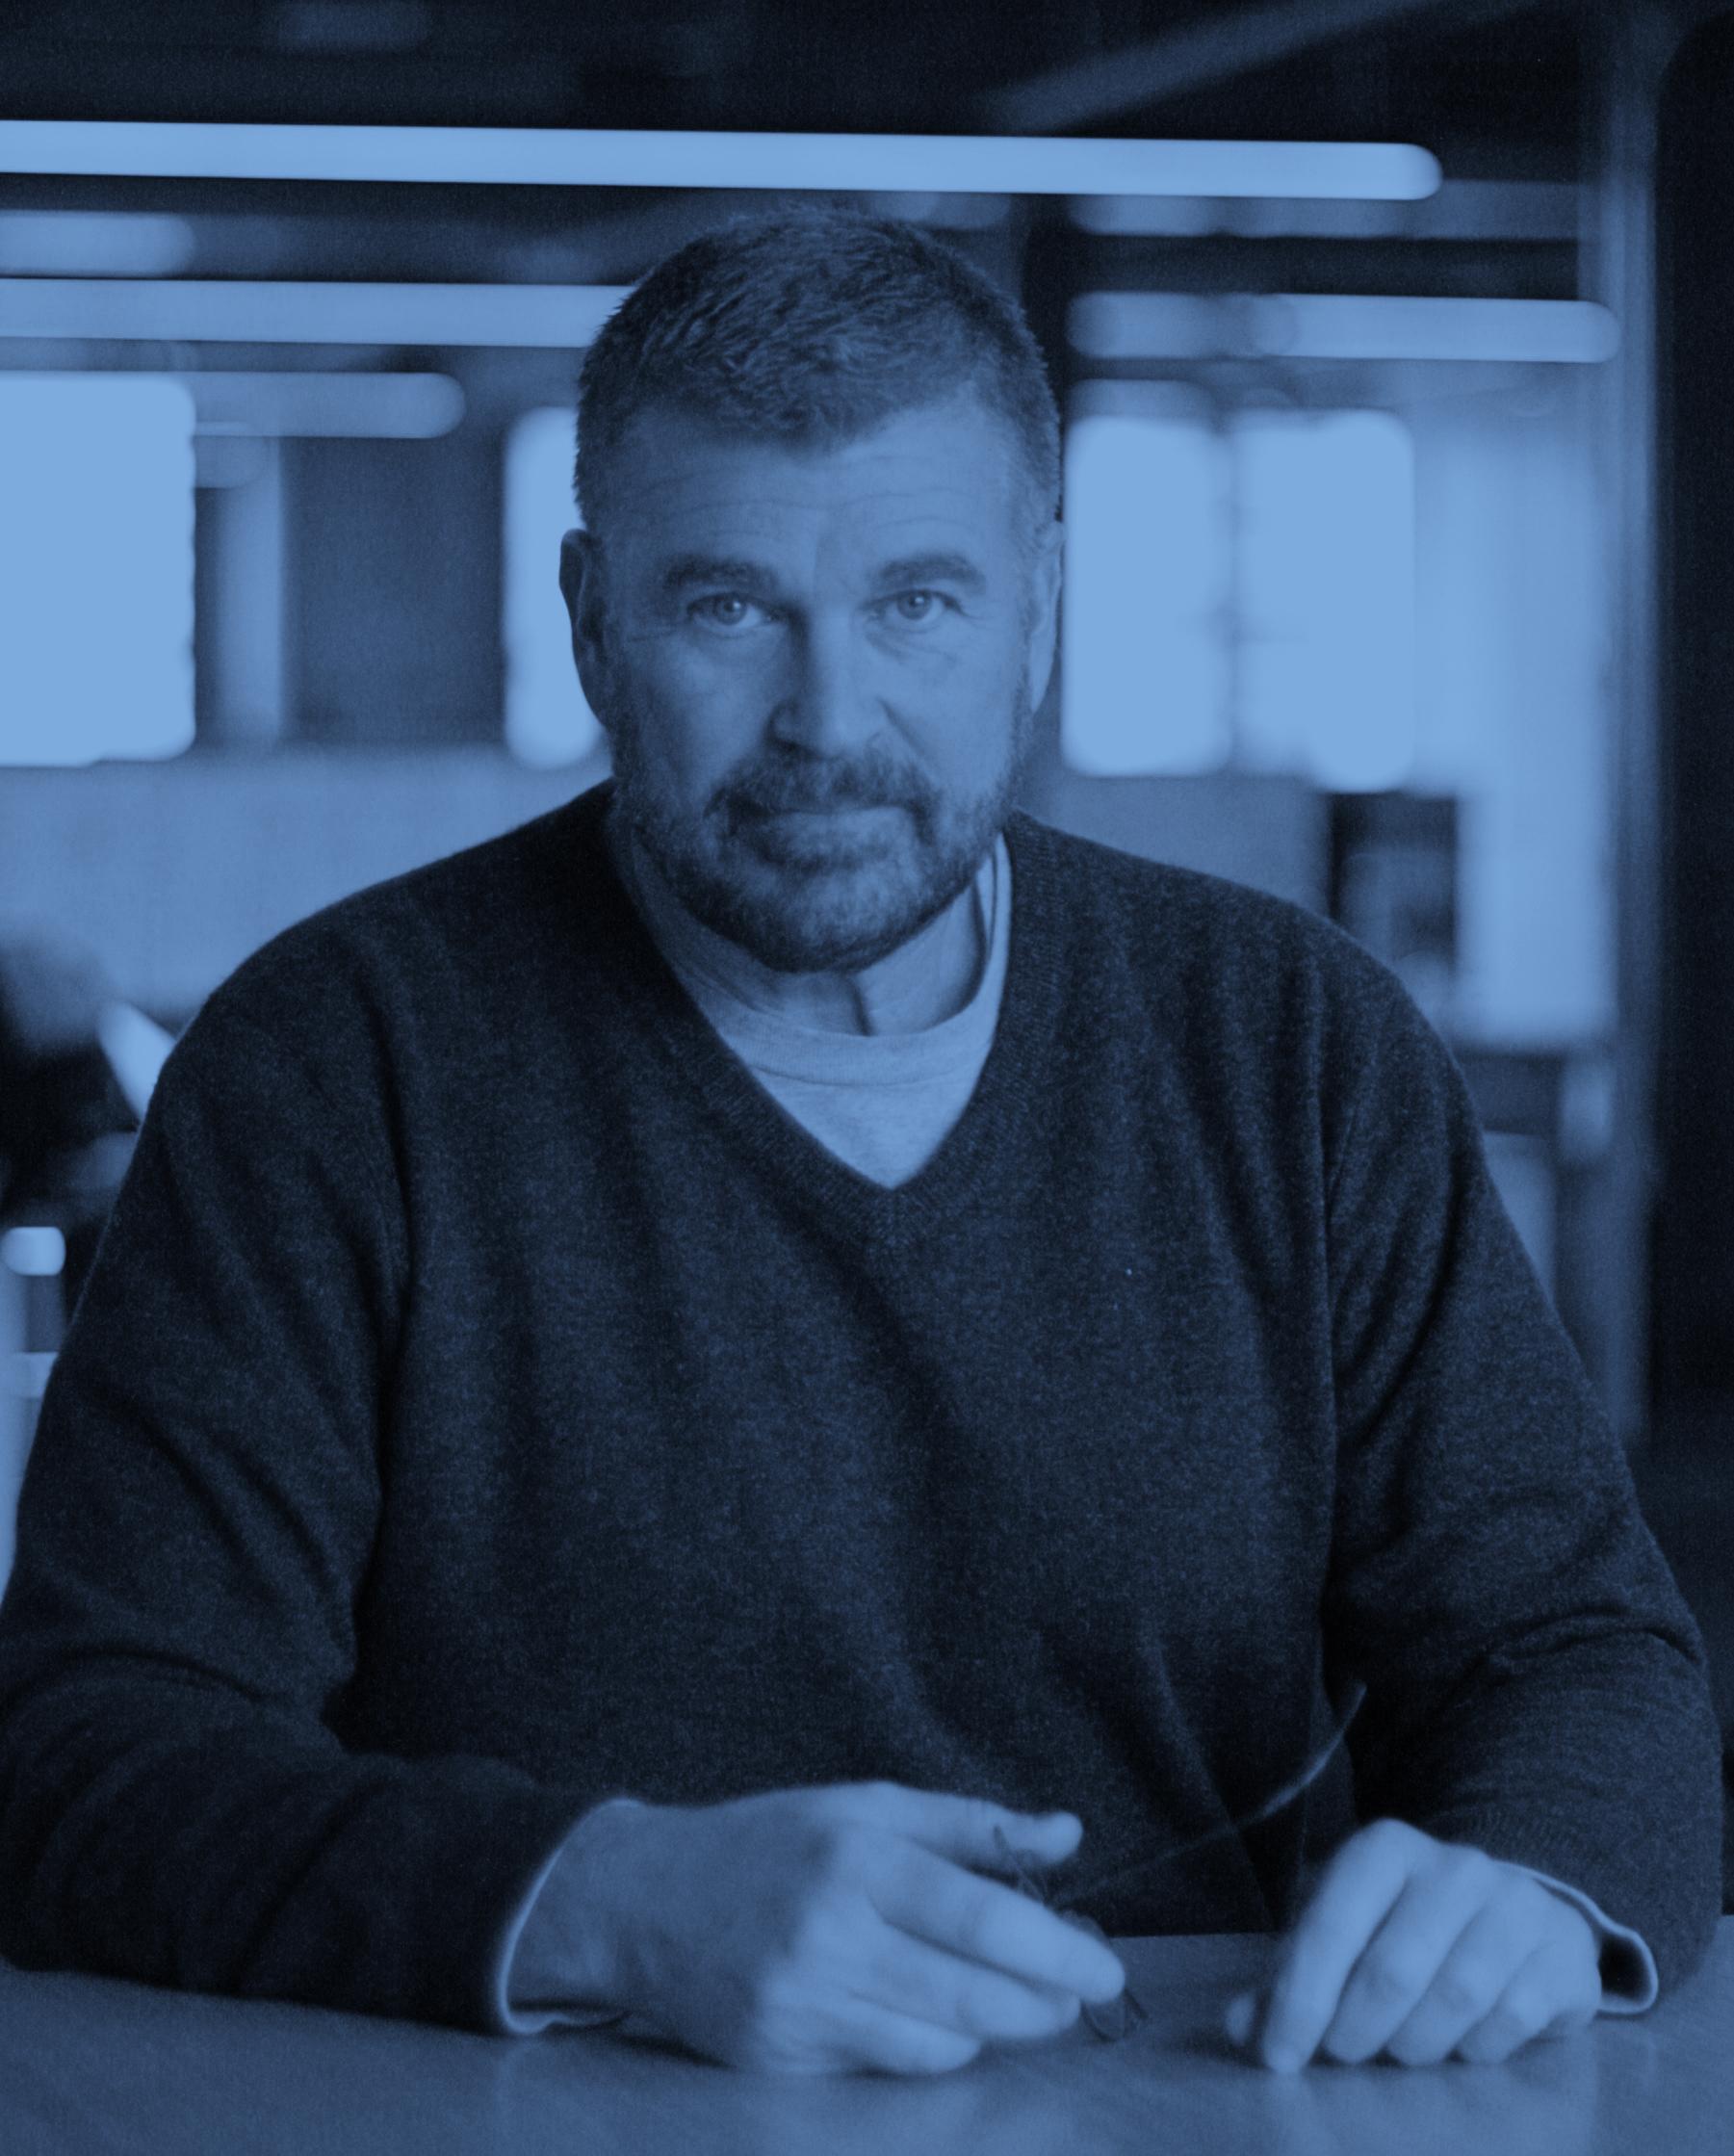 <b>Ron Carlson</b><br>Co-founder/CEO